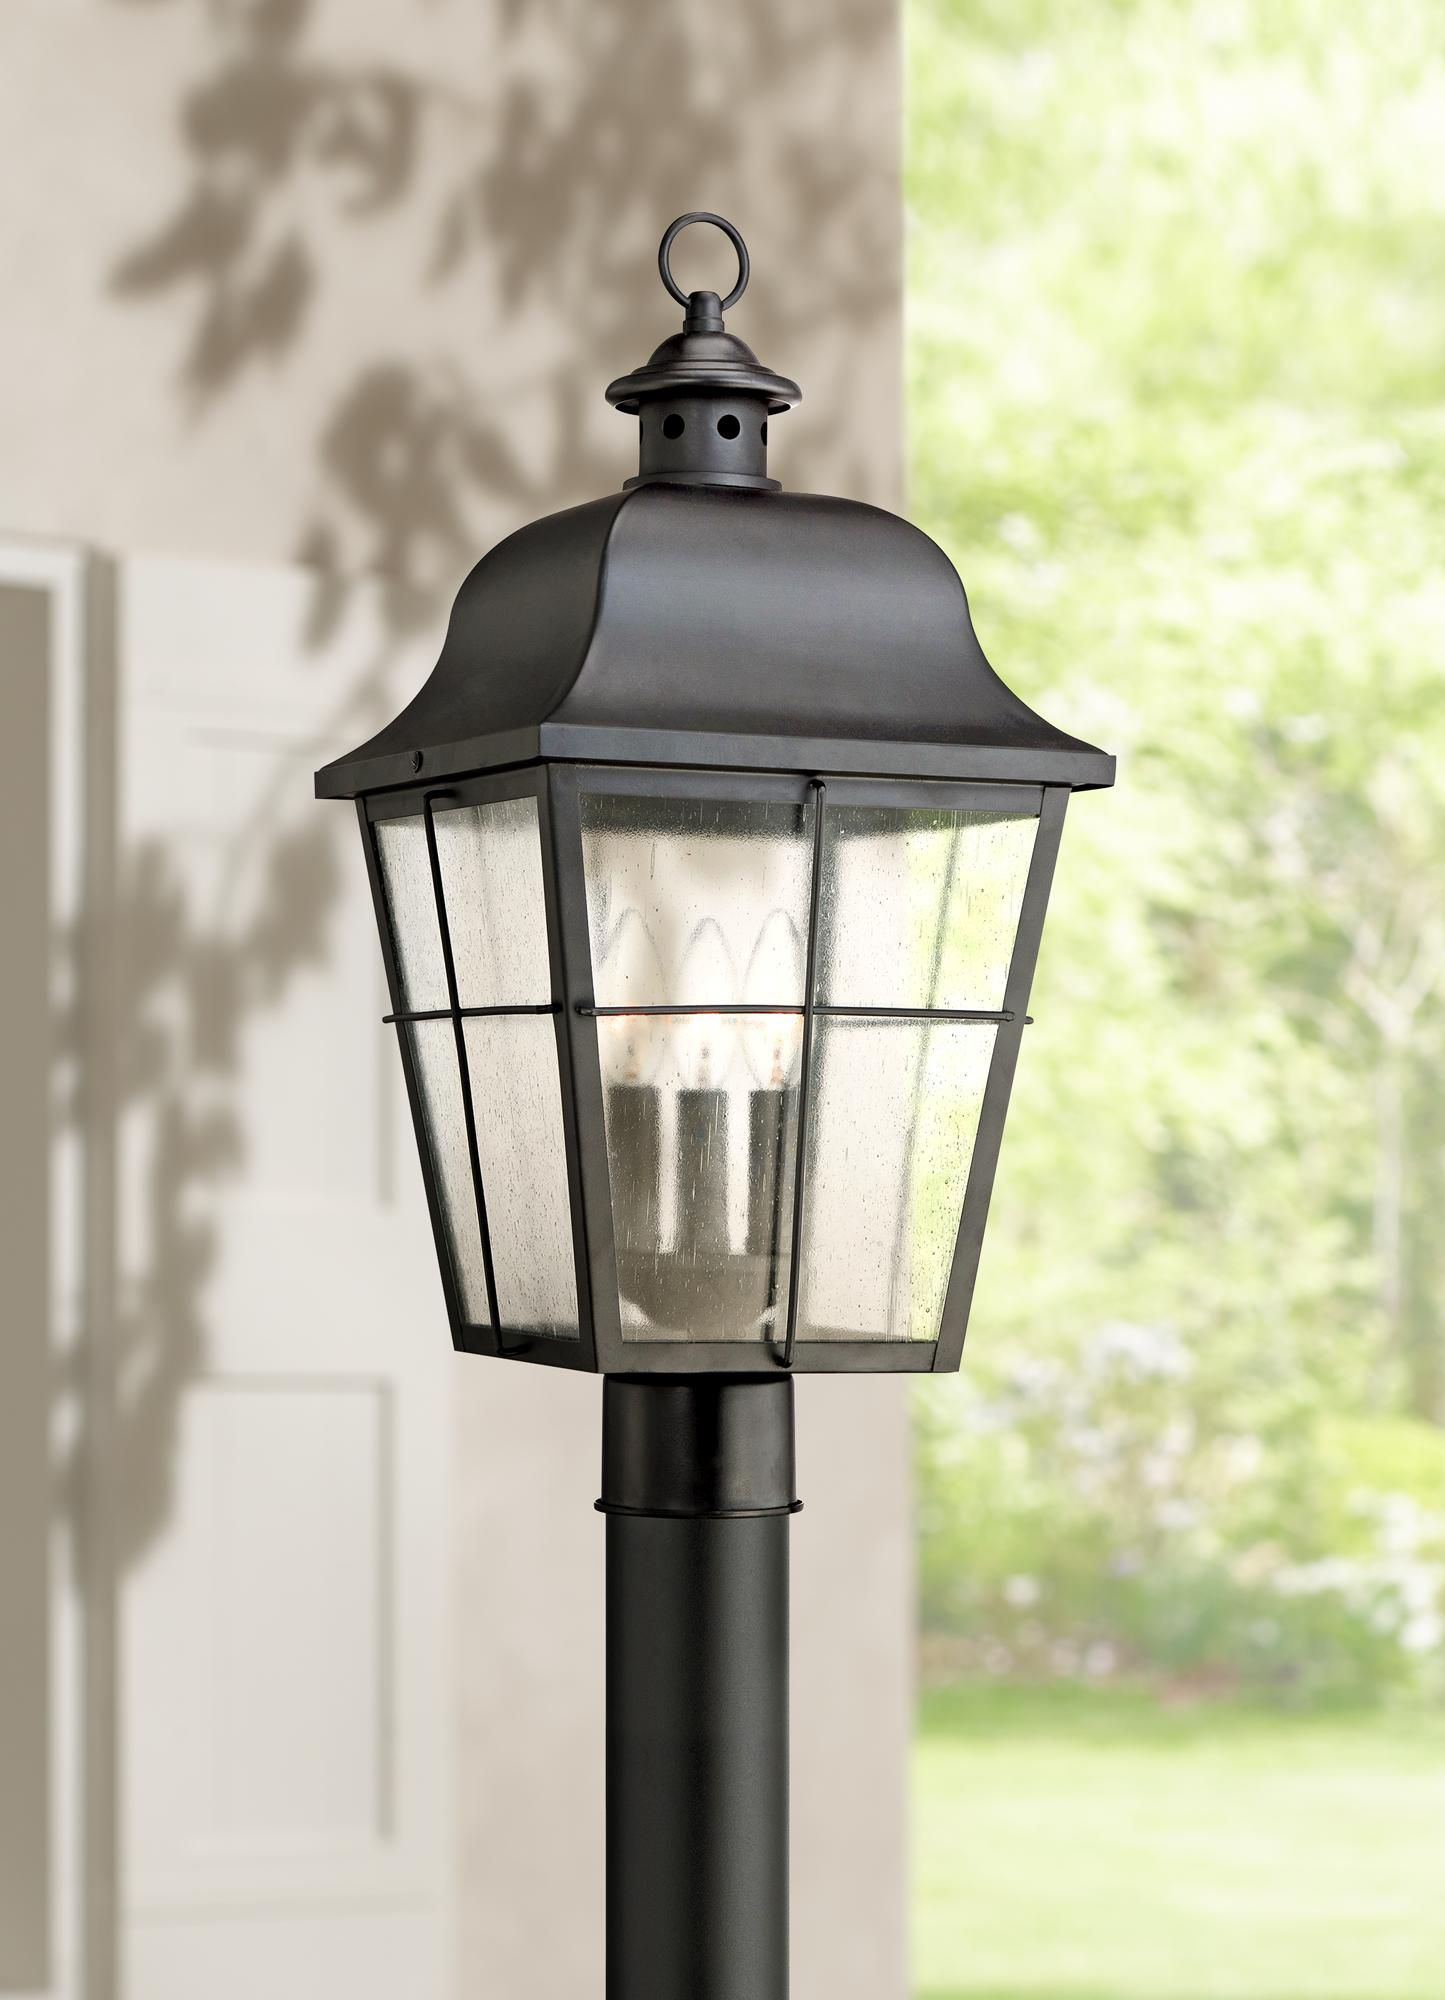 Quoizel Millhouse 21 1 2 High Black Outdoor Post Light 5f669 Lamps Plus Lamp Post Lights Outdoor Post Lights Post Lights